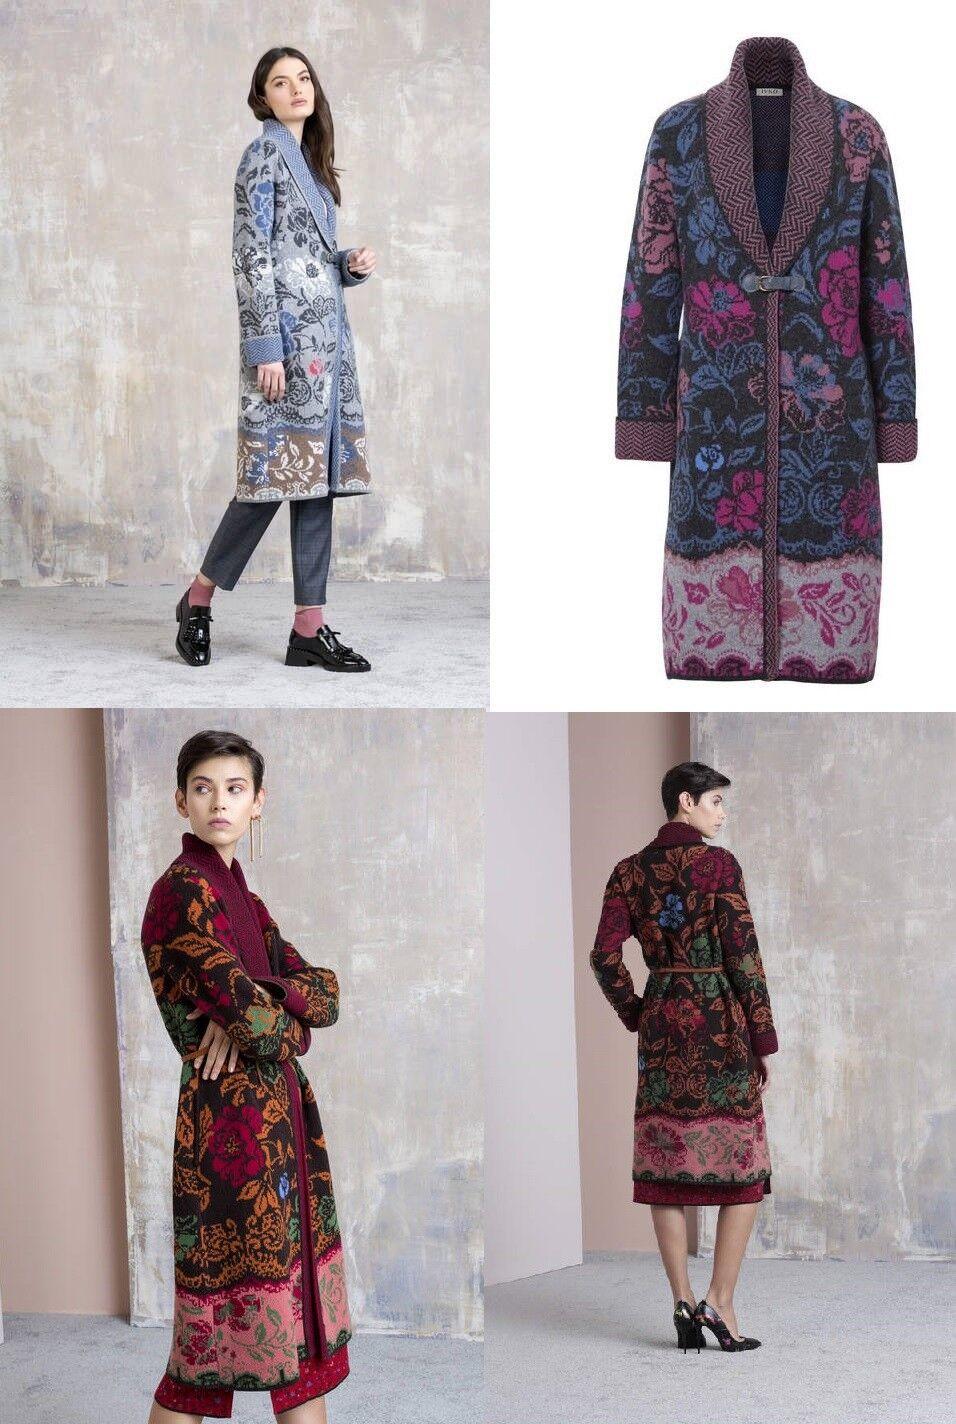 IVKO Coat blå grå Sones Lana Wool Coat med Floral fantasi 8202